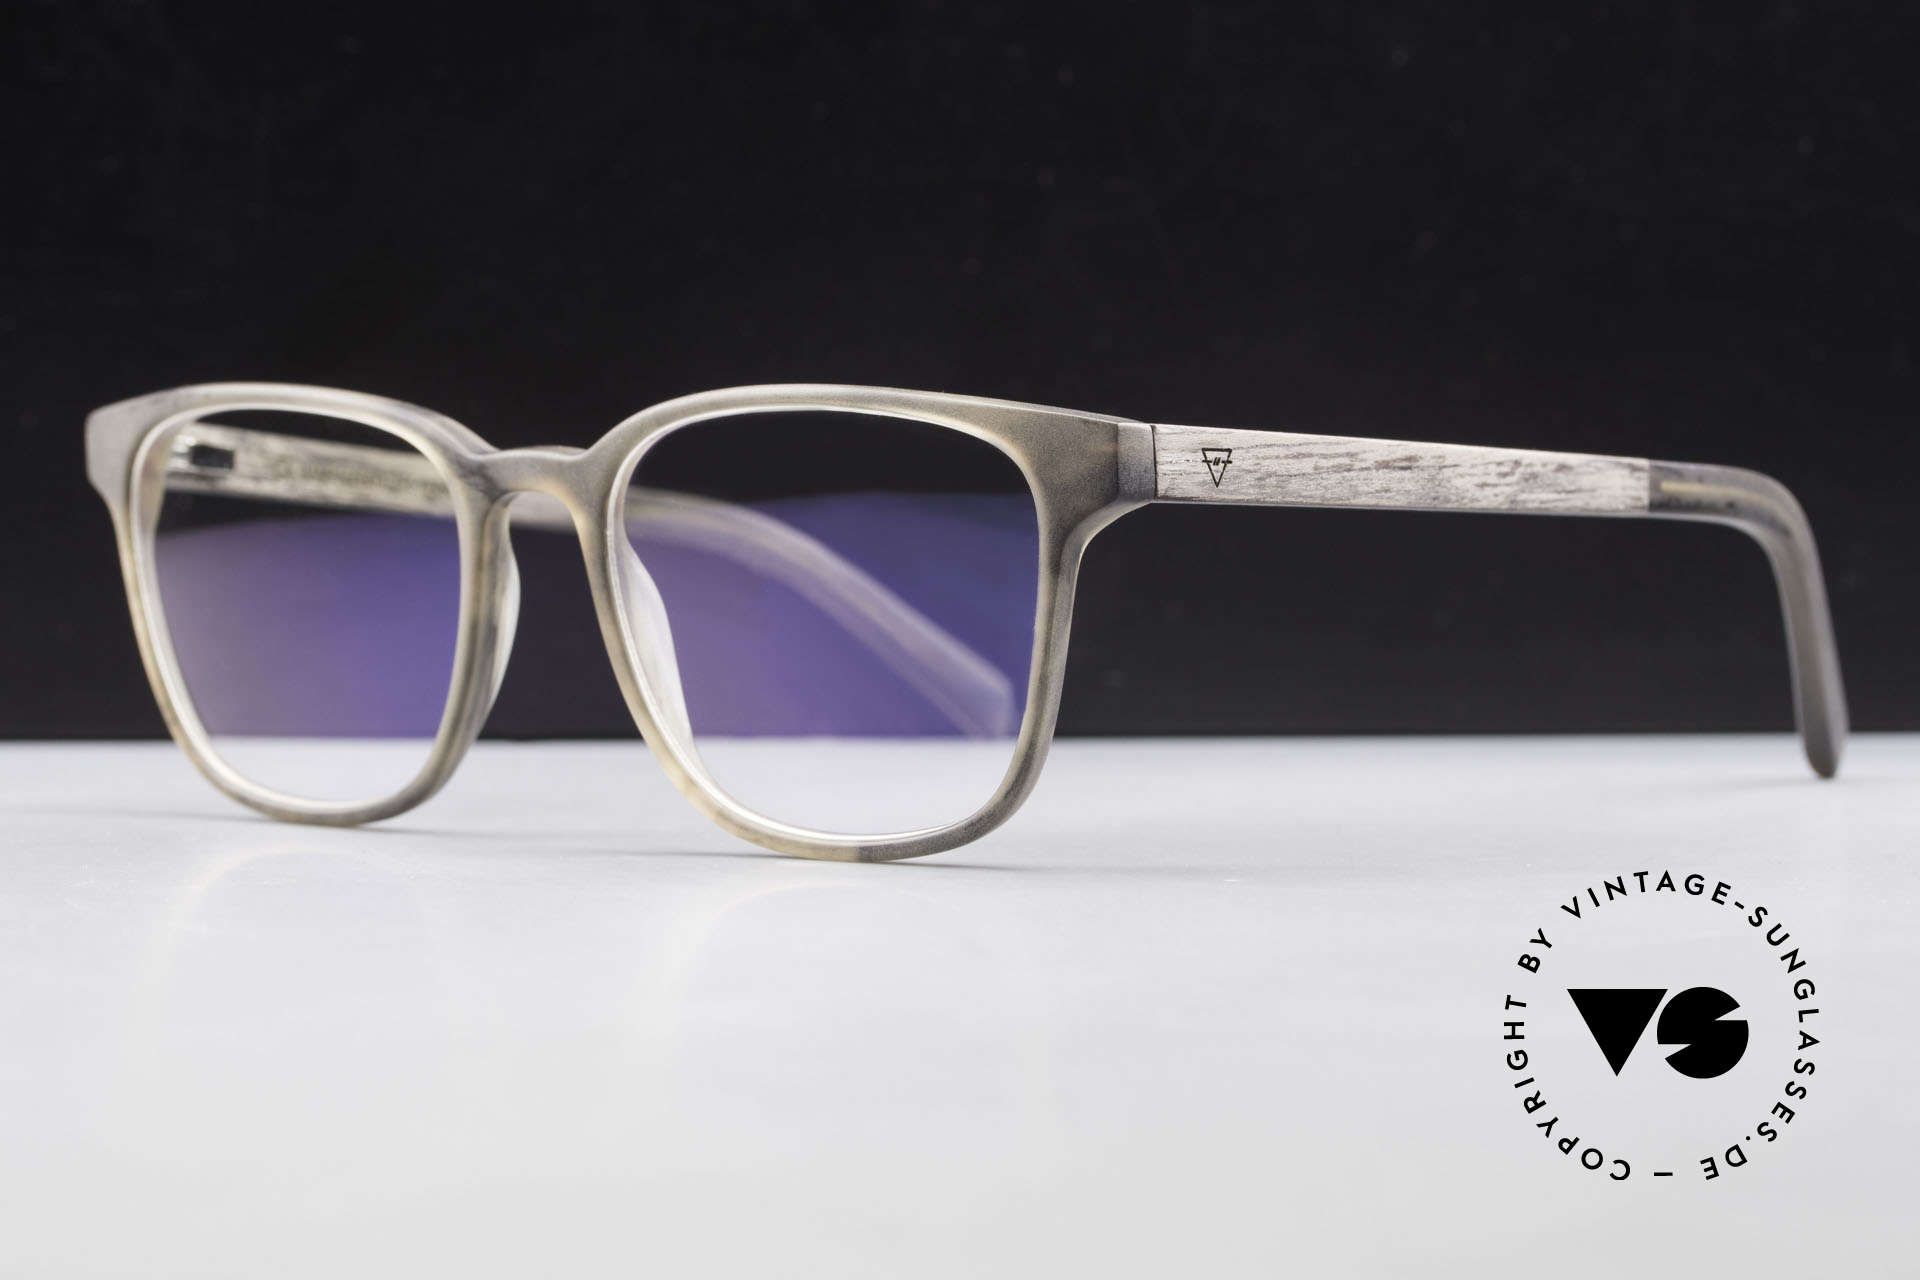 Kerbholz Ludwig Holzbrille Herren Blackwood, jedes Holz-Modell ist individuell (dank der Maserung), Passend für Herren